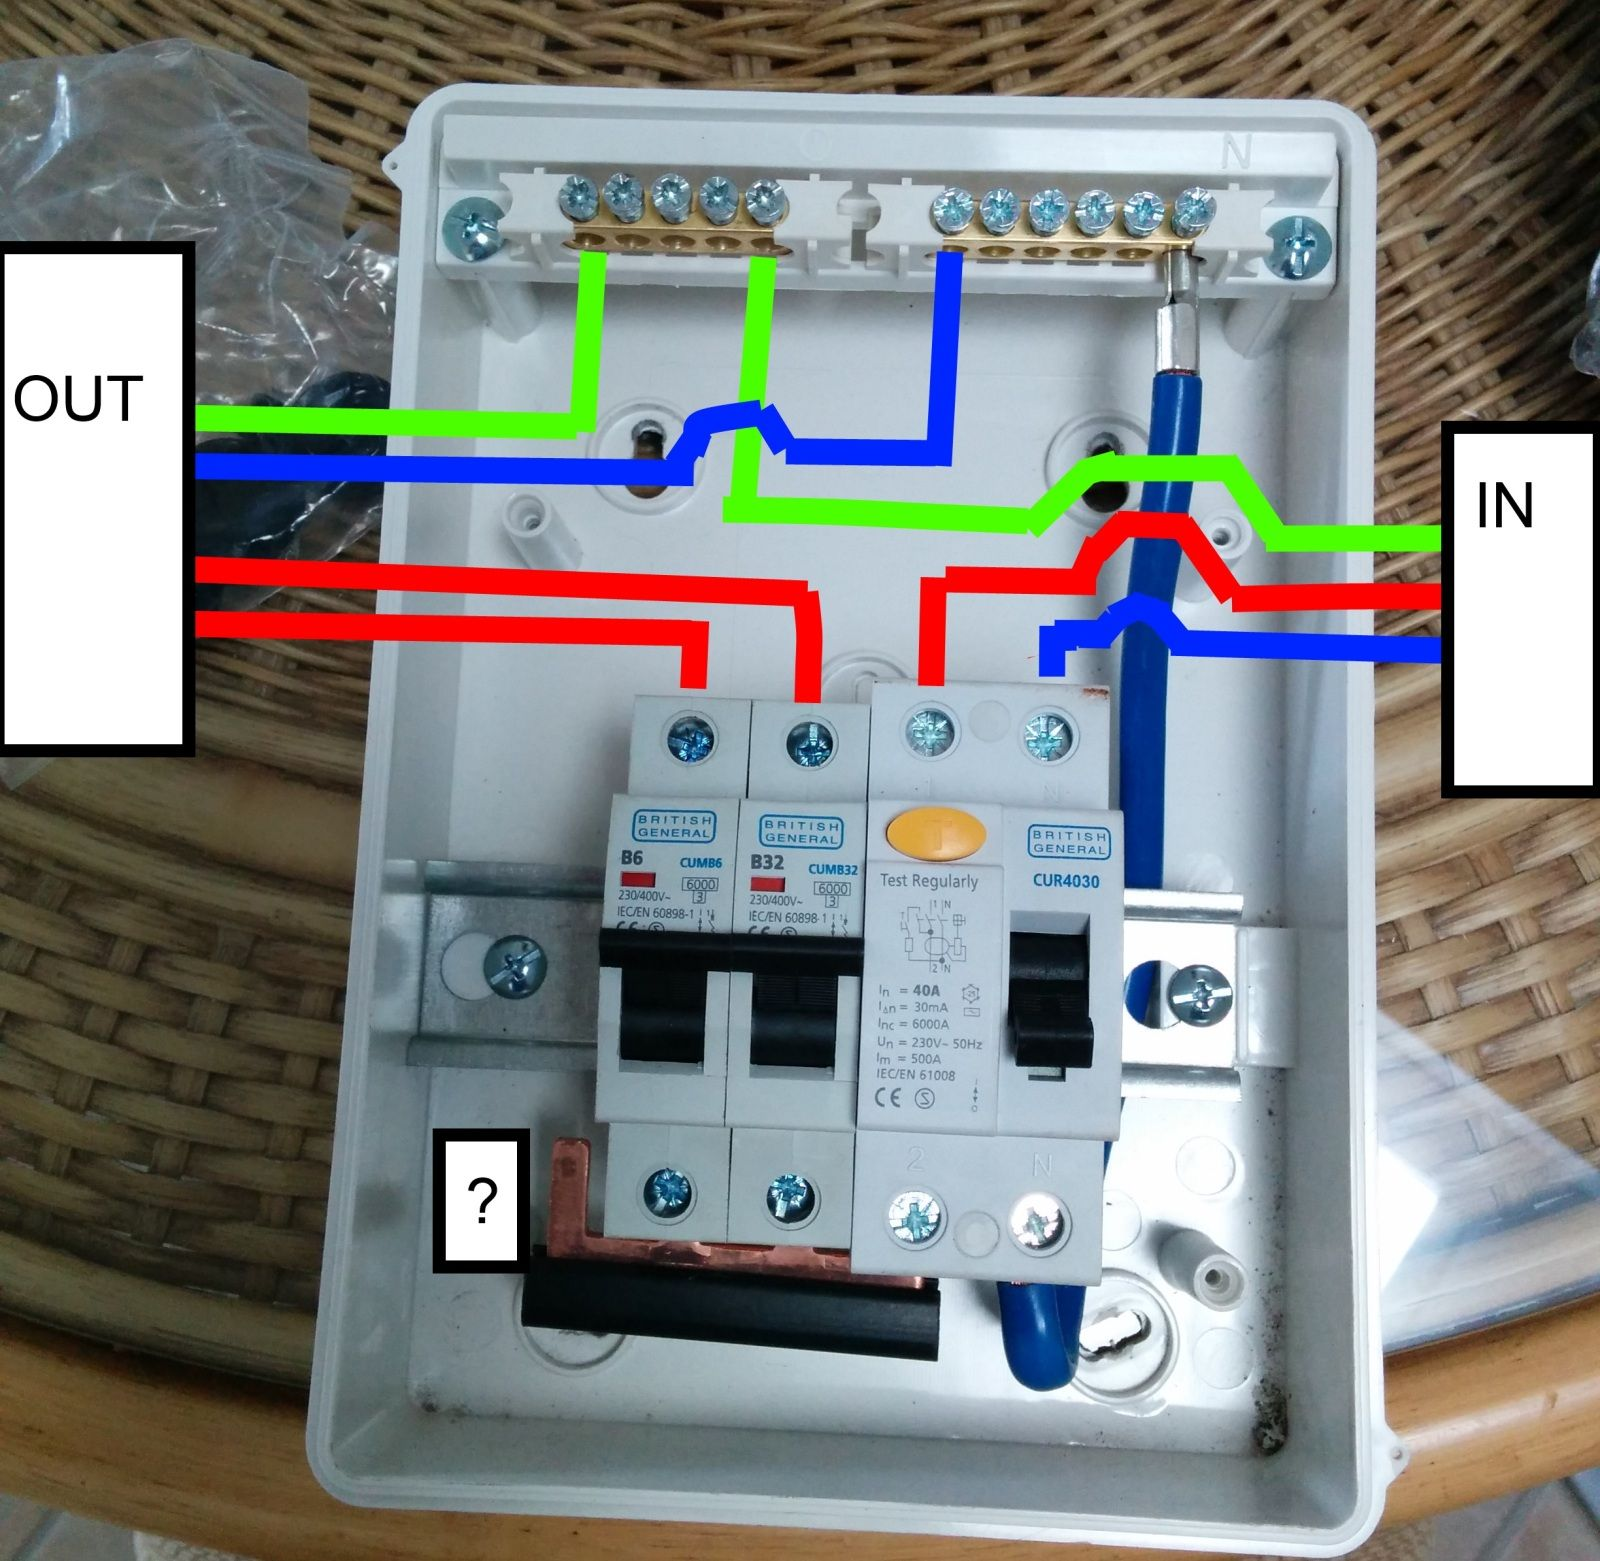 wiring diagram garage rcd unit wiring diagram paper wiring diagram garage rcd unit wiring diagram operations [ 1600 x 1561 Pixel ]